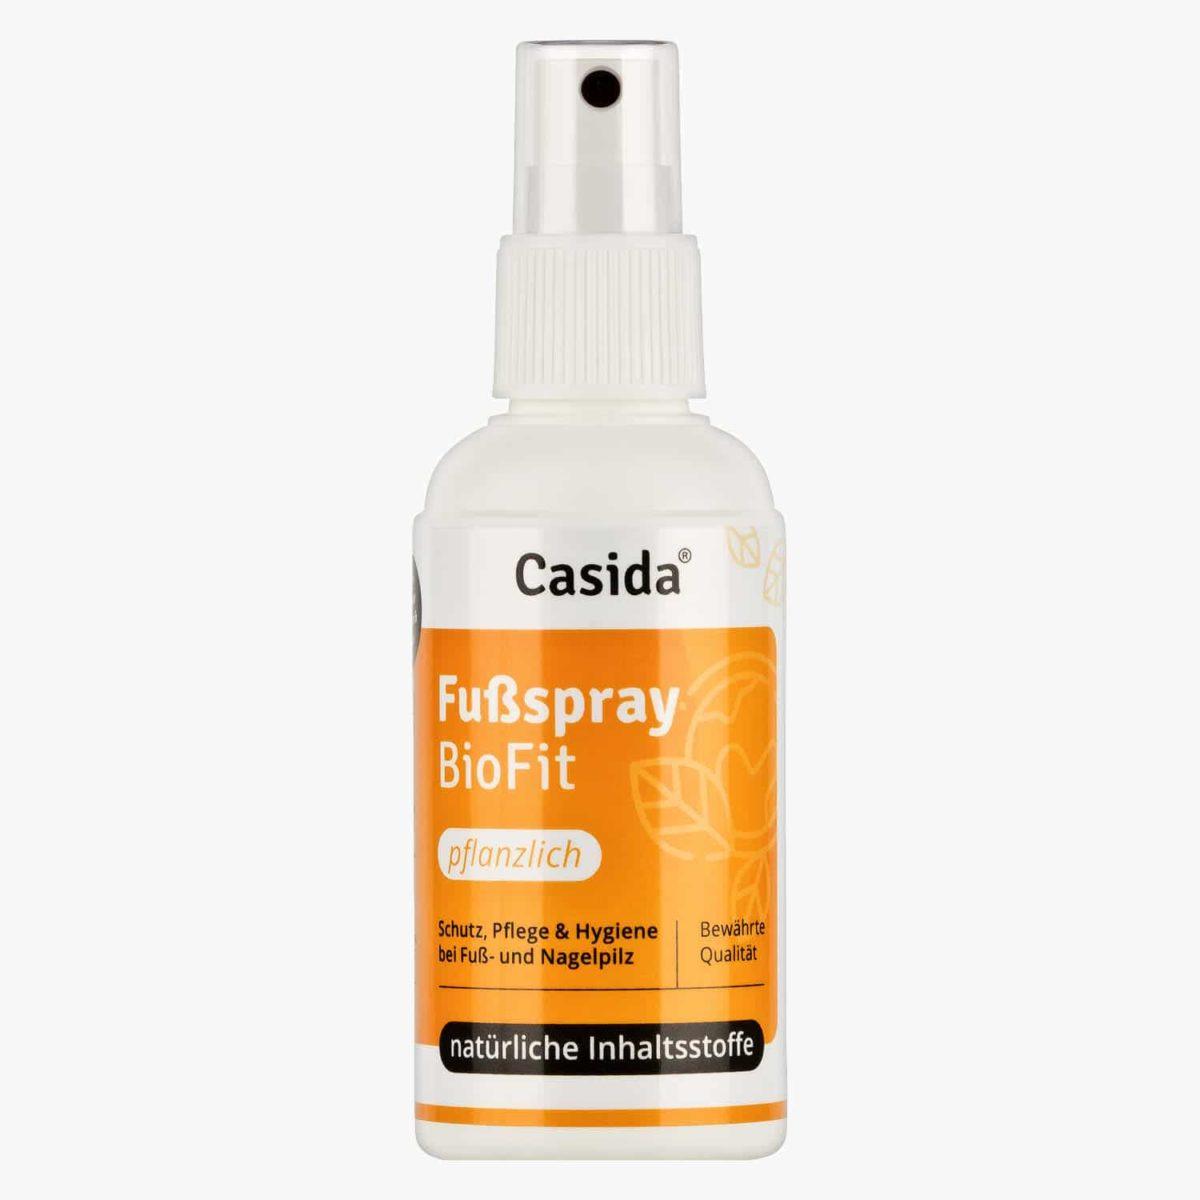 Casida Fußspray BioFit Pflanzlich 100 ml PZN DE 10751322 PZN AT 4285761 UVP 14,95 € EAN 4260518460765 Pilzsporen